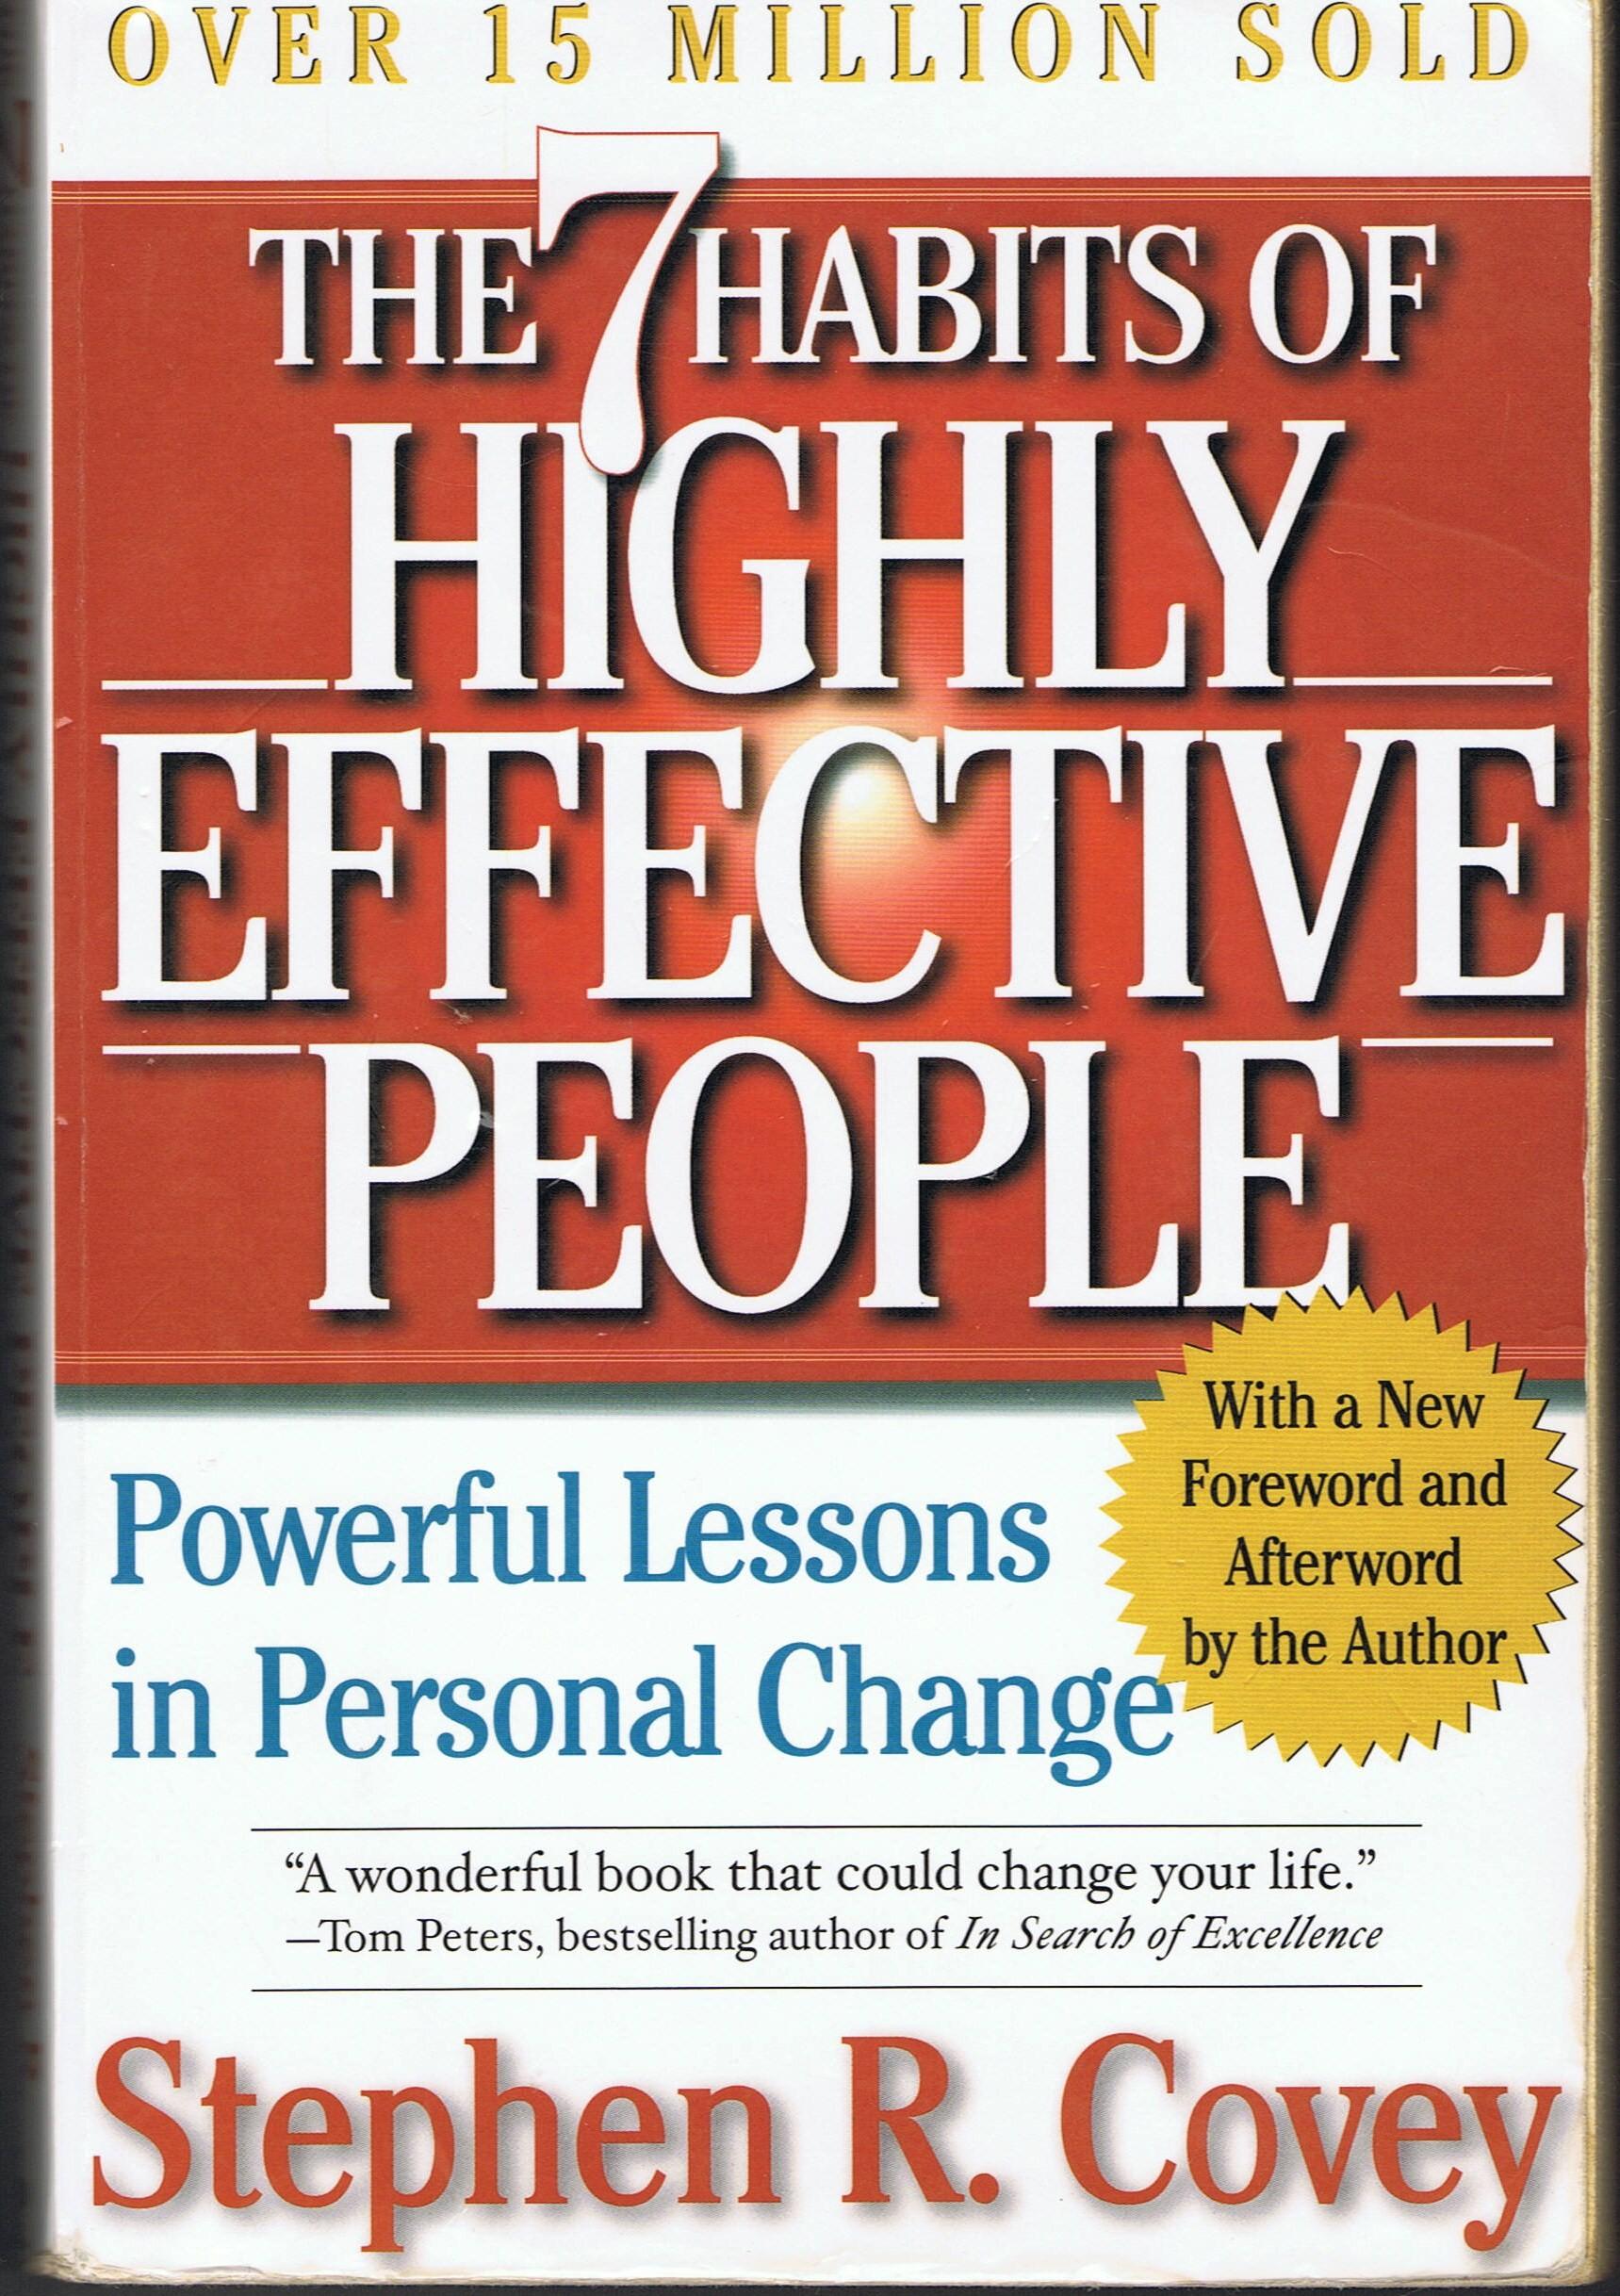 7 Habits of Highly Effective People قراءة في كتاب العادات السبع للناس الأكثر فعالية